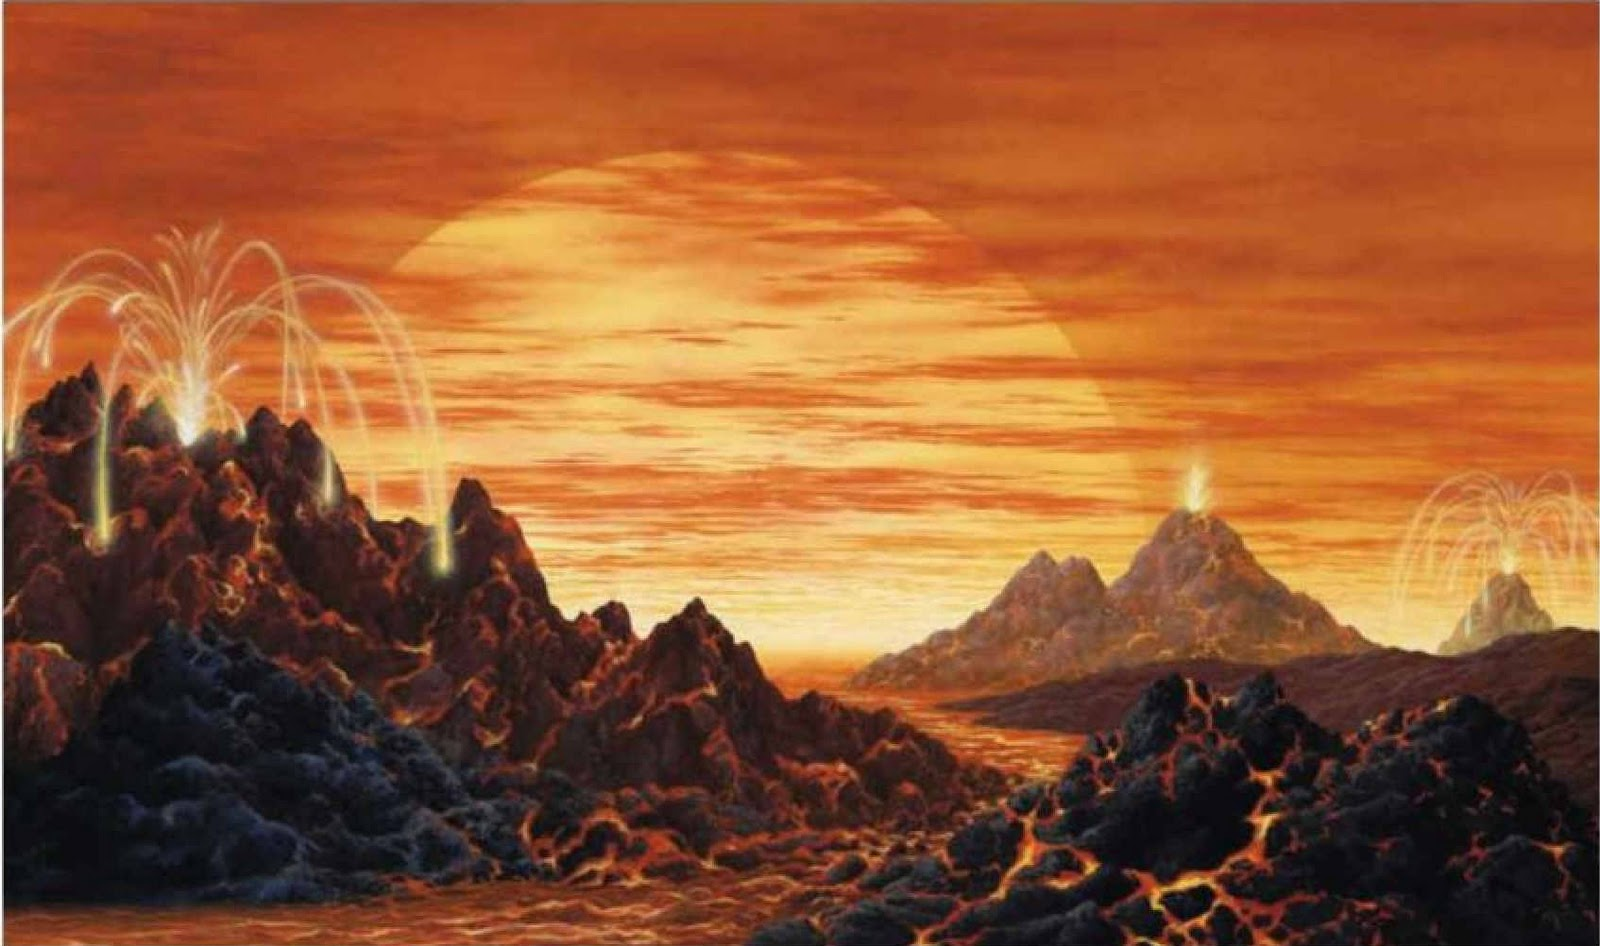 exoplanet landscape orbiting giant planet - photo #3